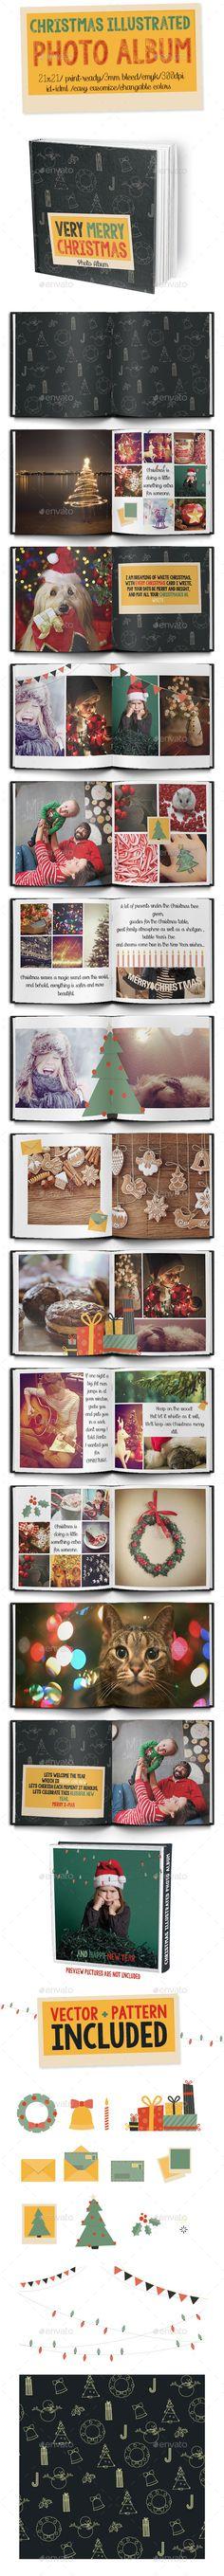 Christmas Illustrated Photo Album Template #design #print Download: http://graphicriver.net/item/christmas-illustrated-photo-album/9379933?ref=ksioks